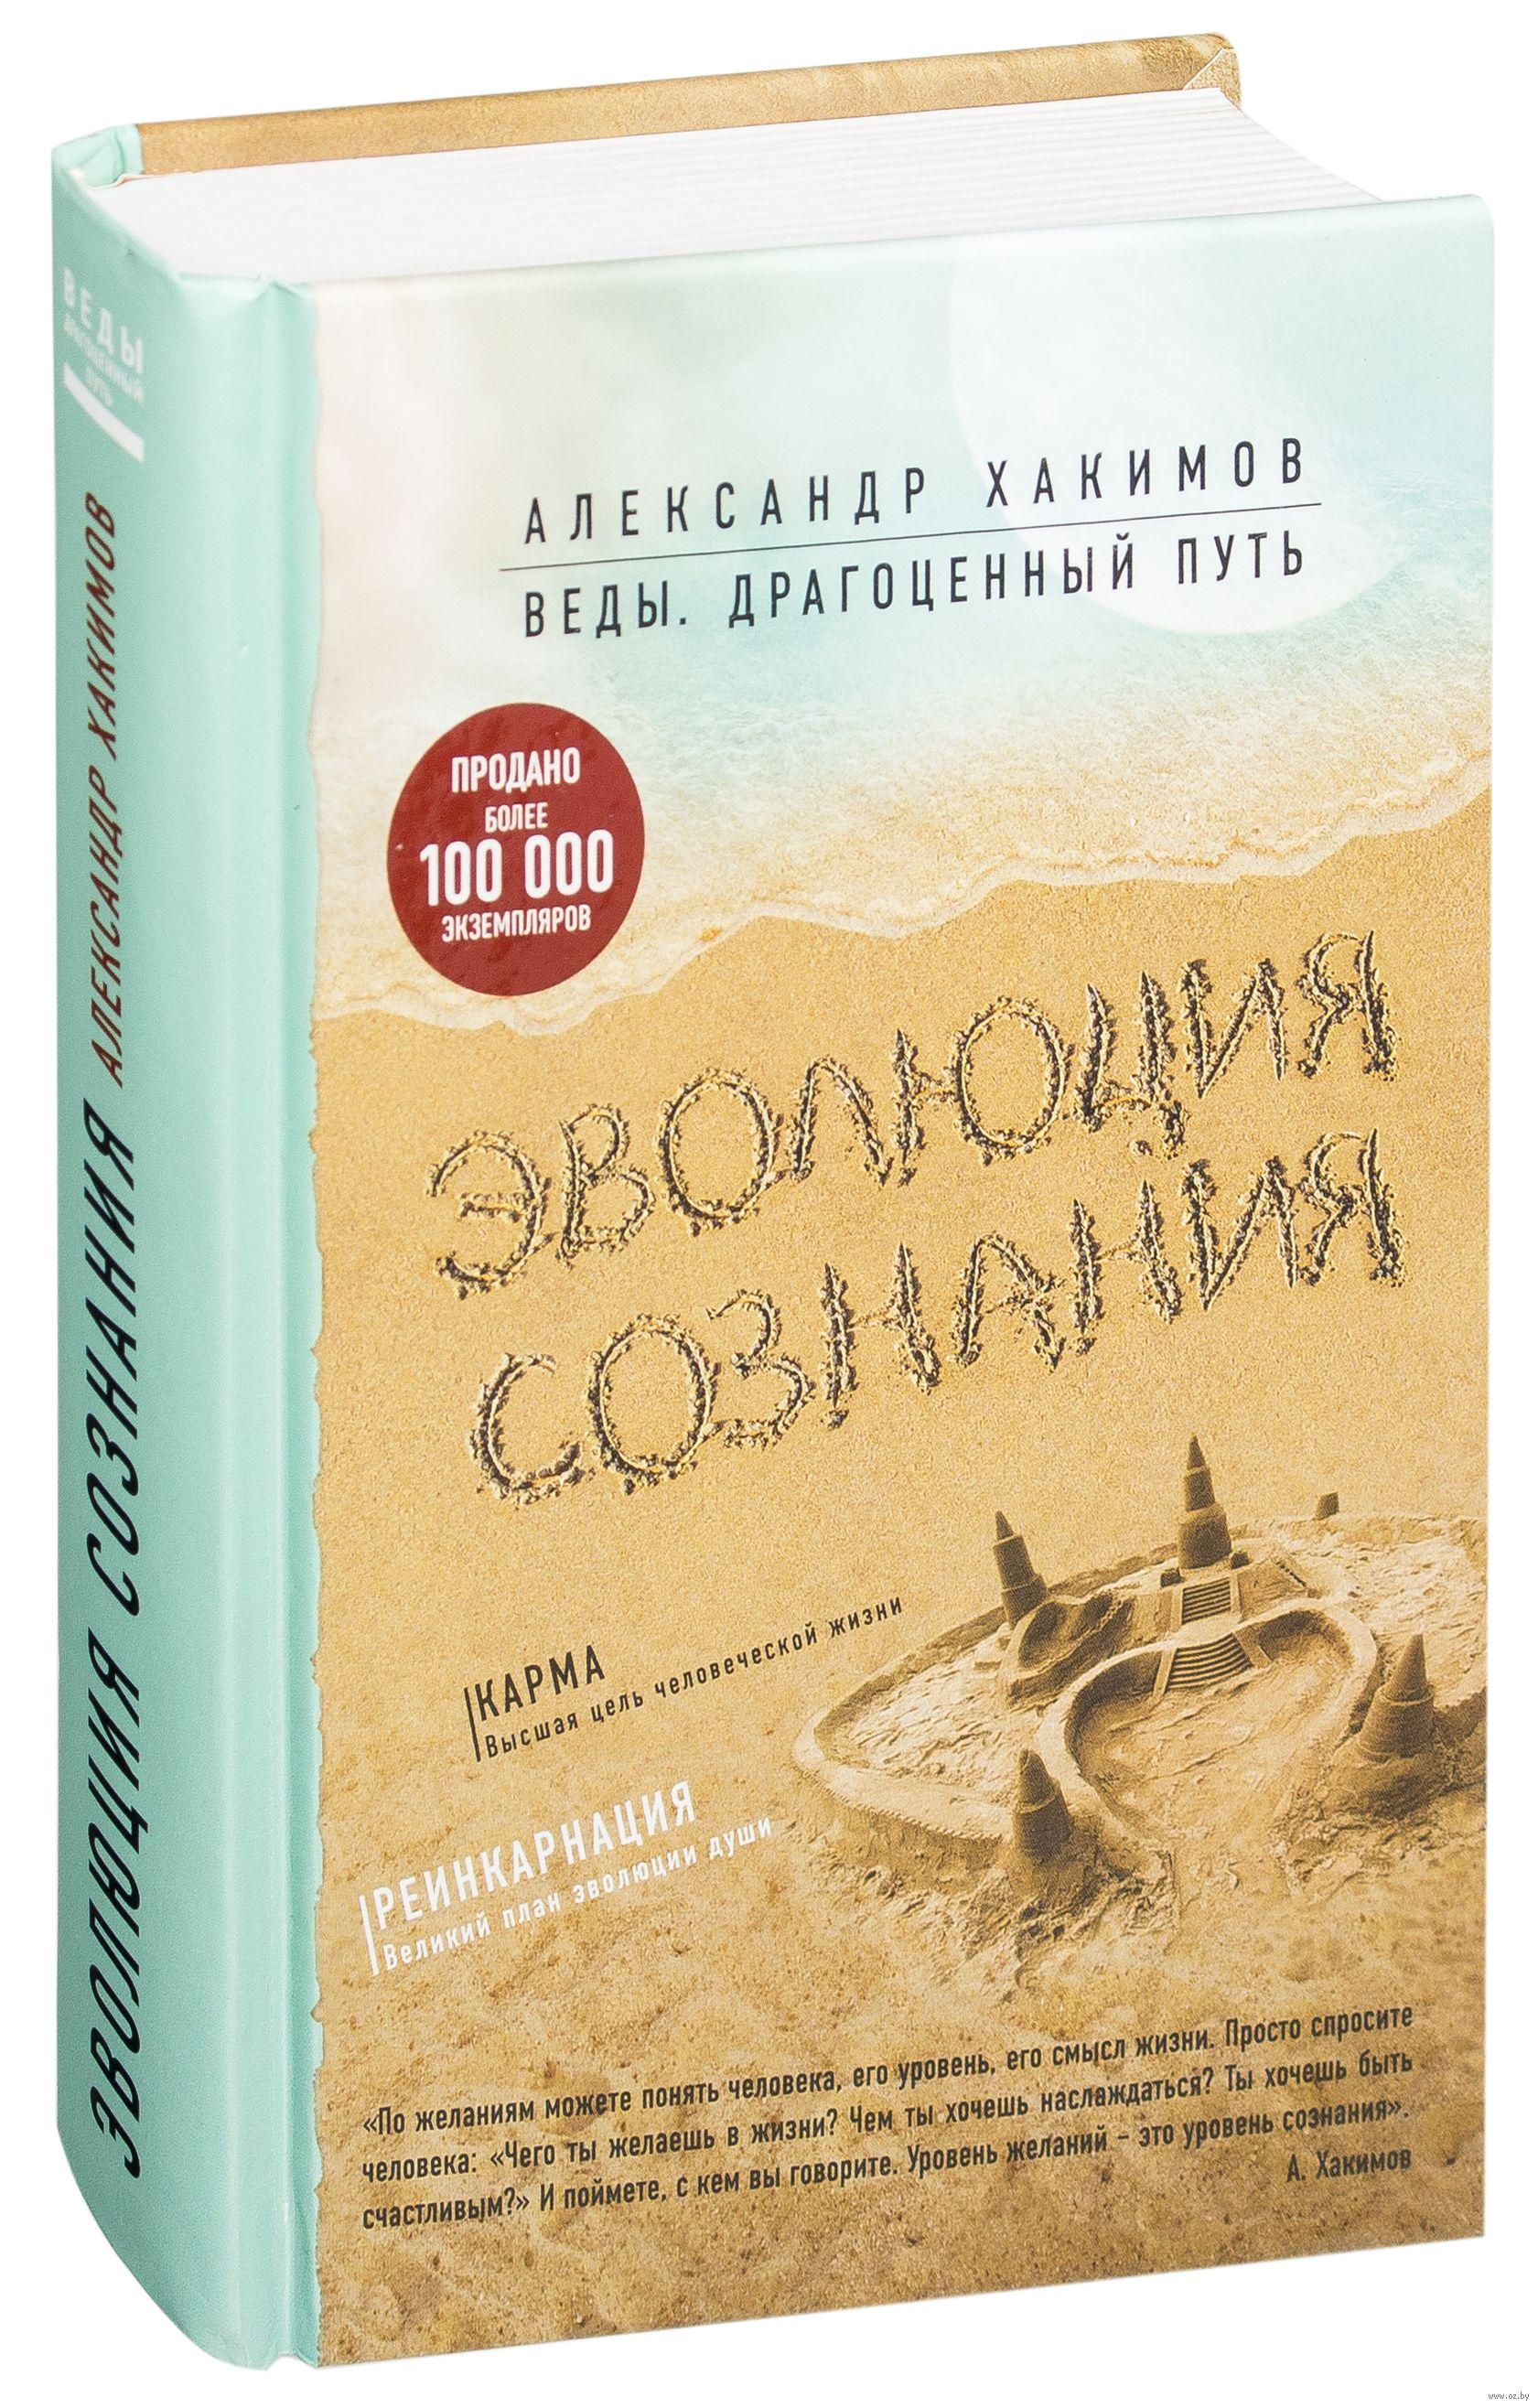 Эволюция сознания» Александр Хакимов - купить книгу «Эволюция ... 6768ae41e6b